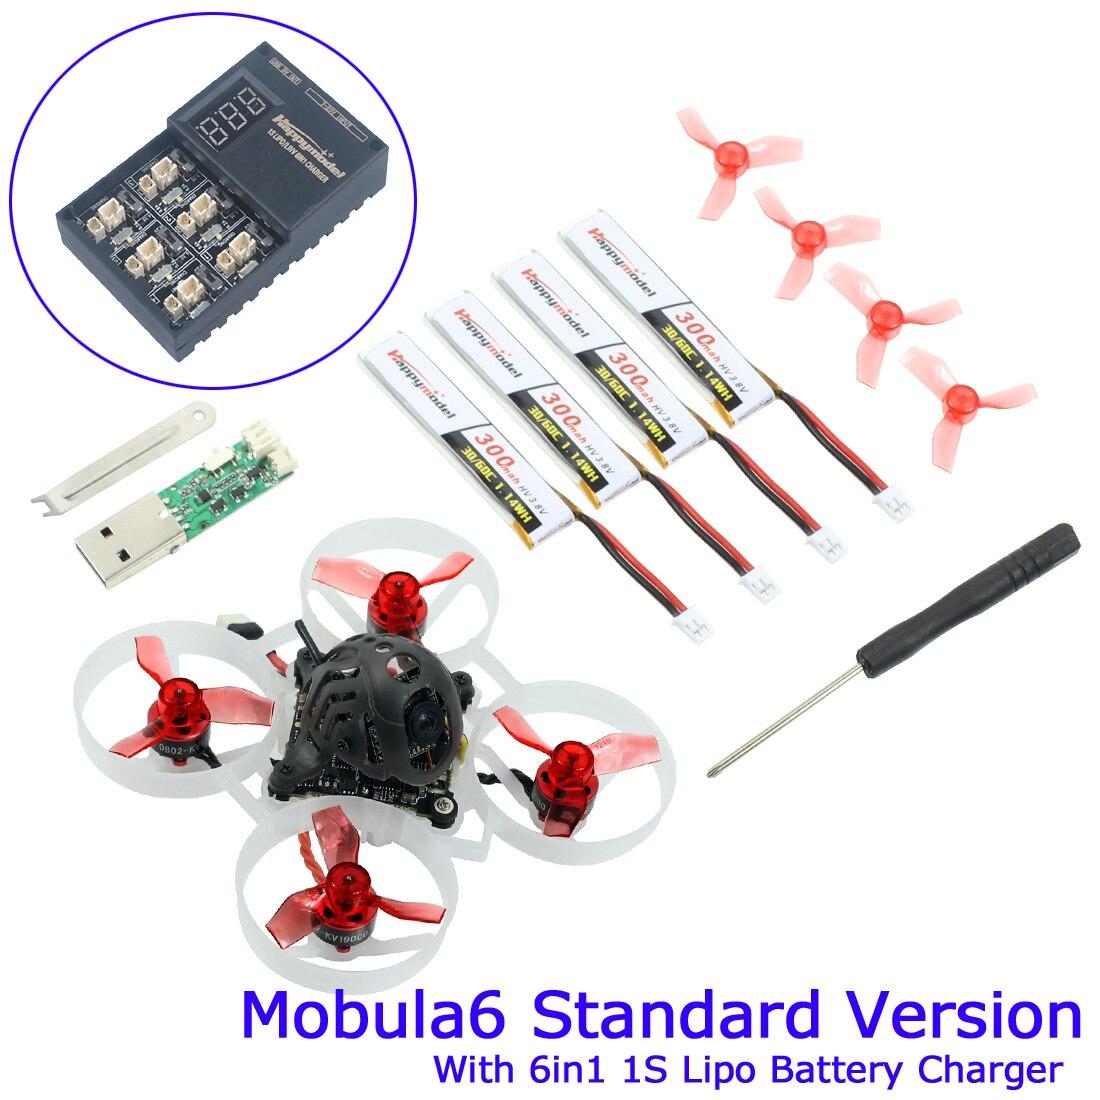 Happymodel Mobula6 Standard BNF 1S 65mm Brushless Bwhoop FPV Racing Drone Crazybee F4 Lite Runcam Nano3 RC Mini Quadcopter Dron